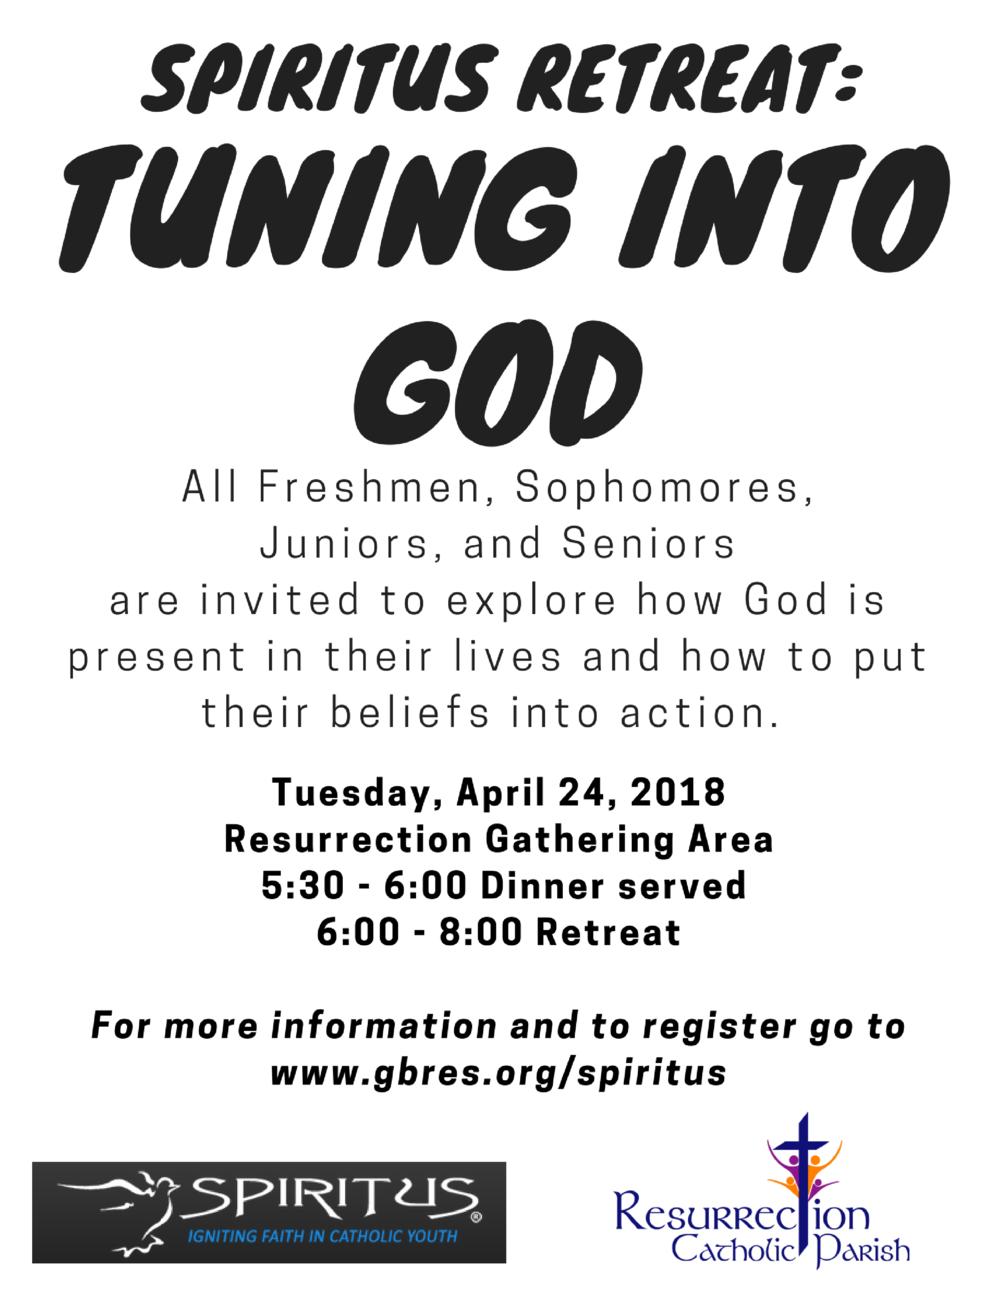 SPIRITUS High School Retreat.png